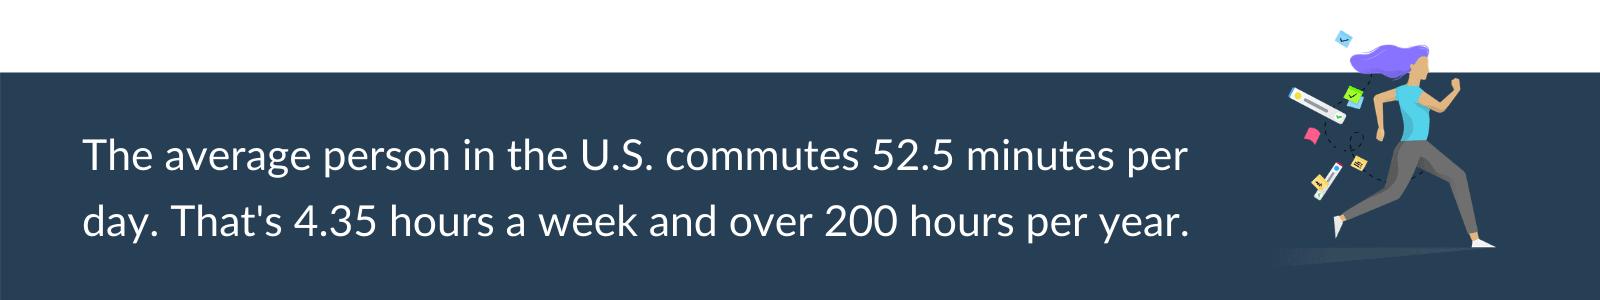 statistiques de navettage travail à distance hubstaff